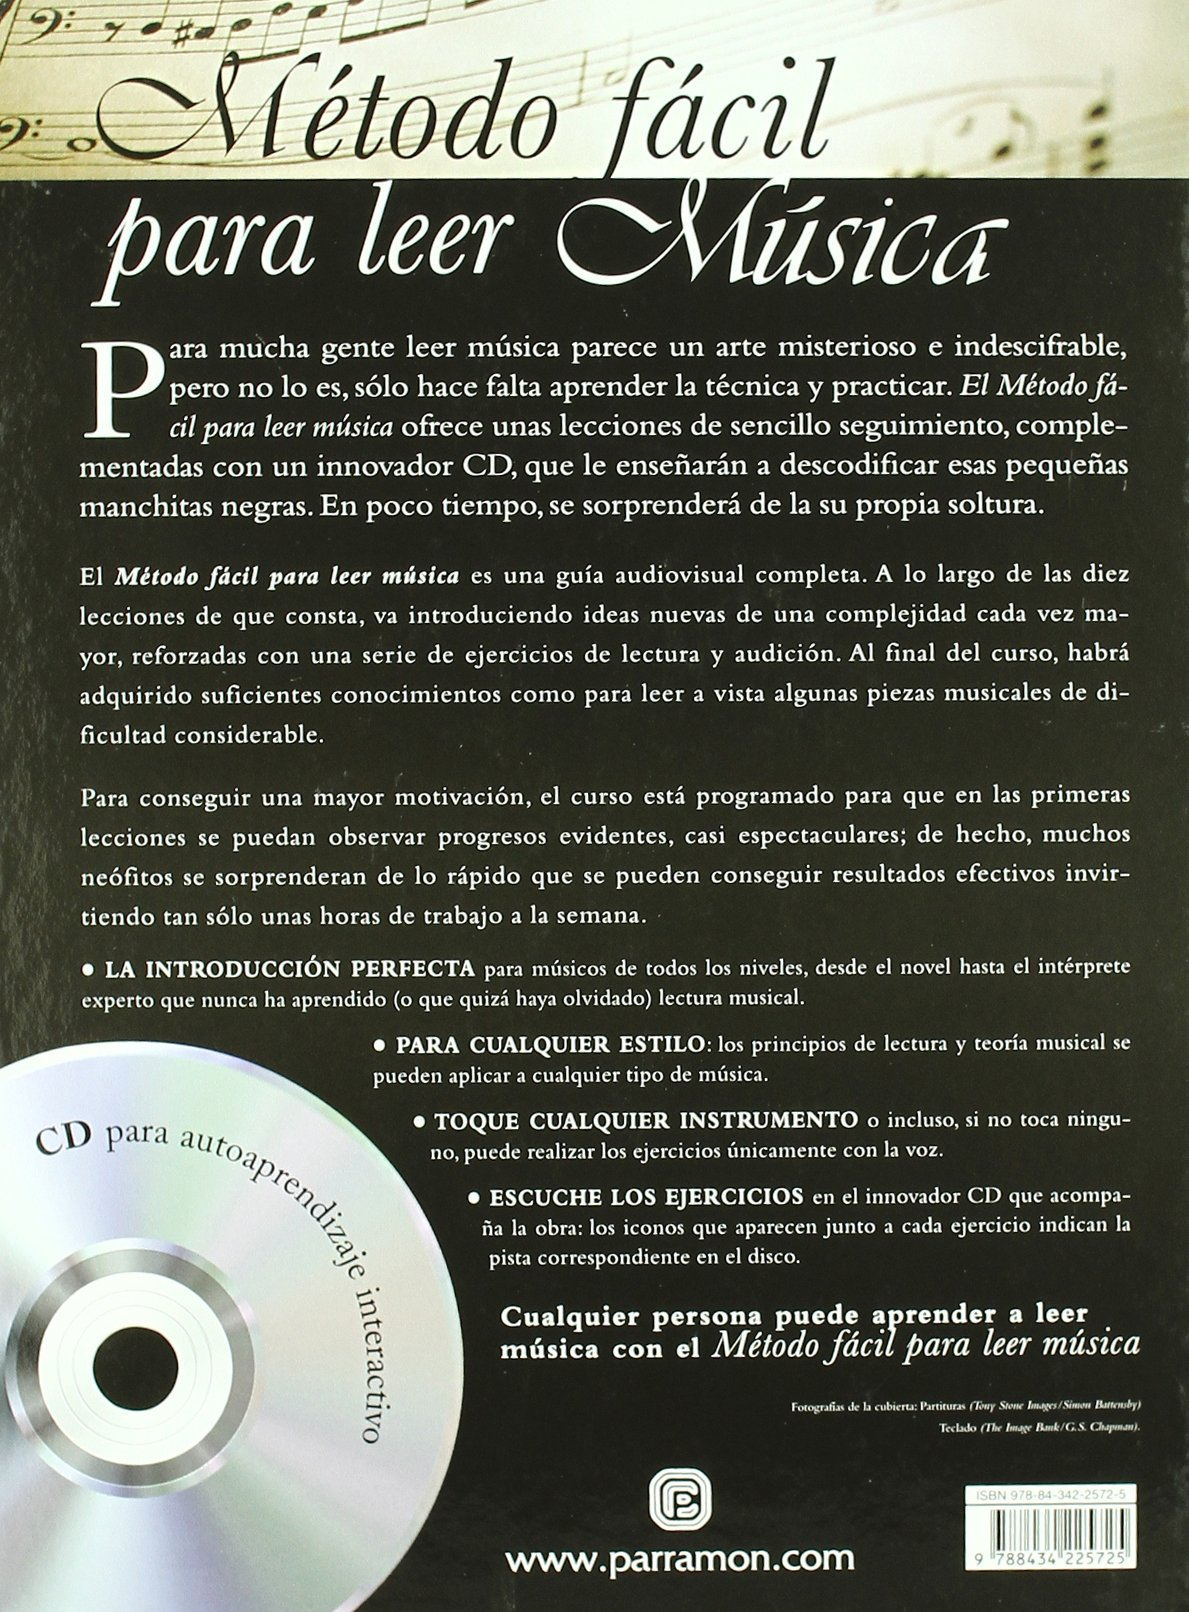 METODO FACIL PARA LEER MUSICA (Música): Amazon.es: Terry Burrows, CARLTON BOOKS LIMITED: Libros